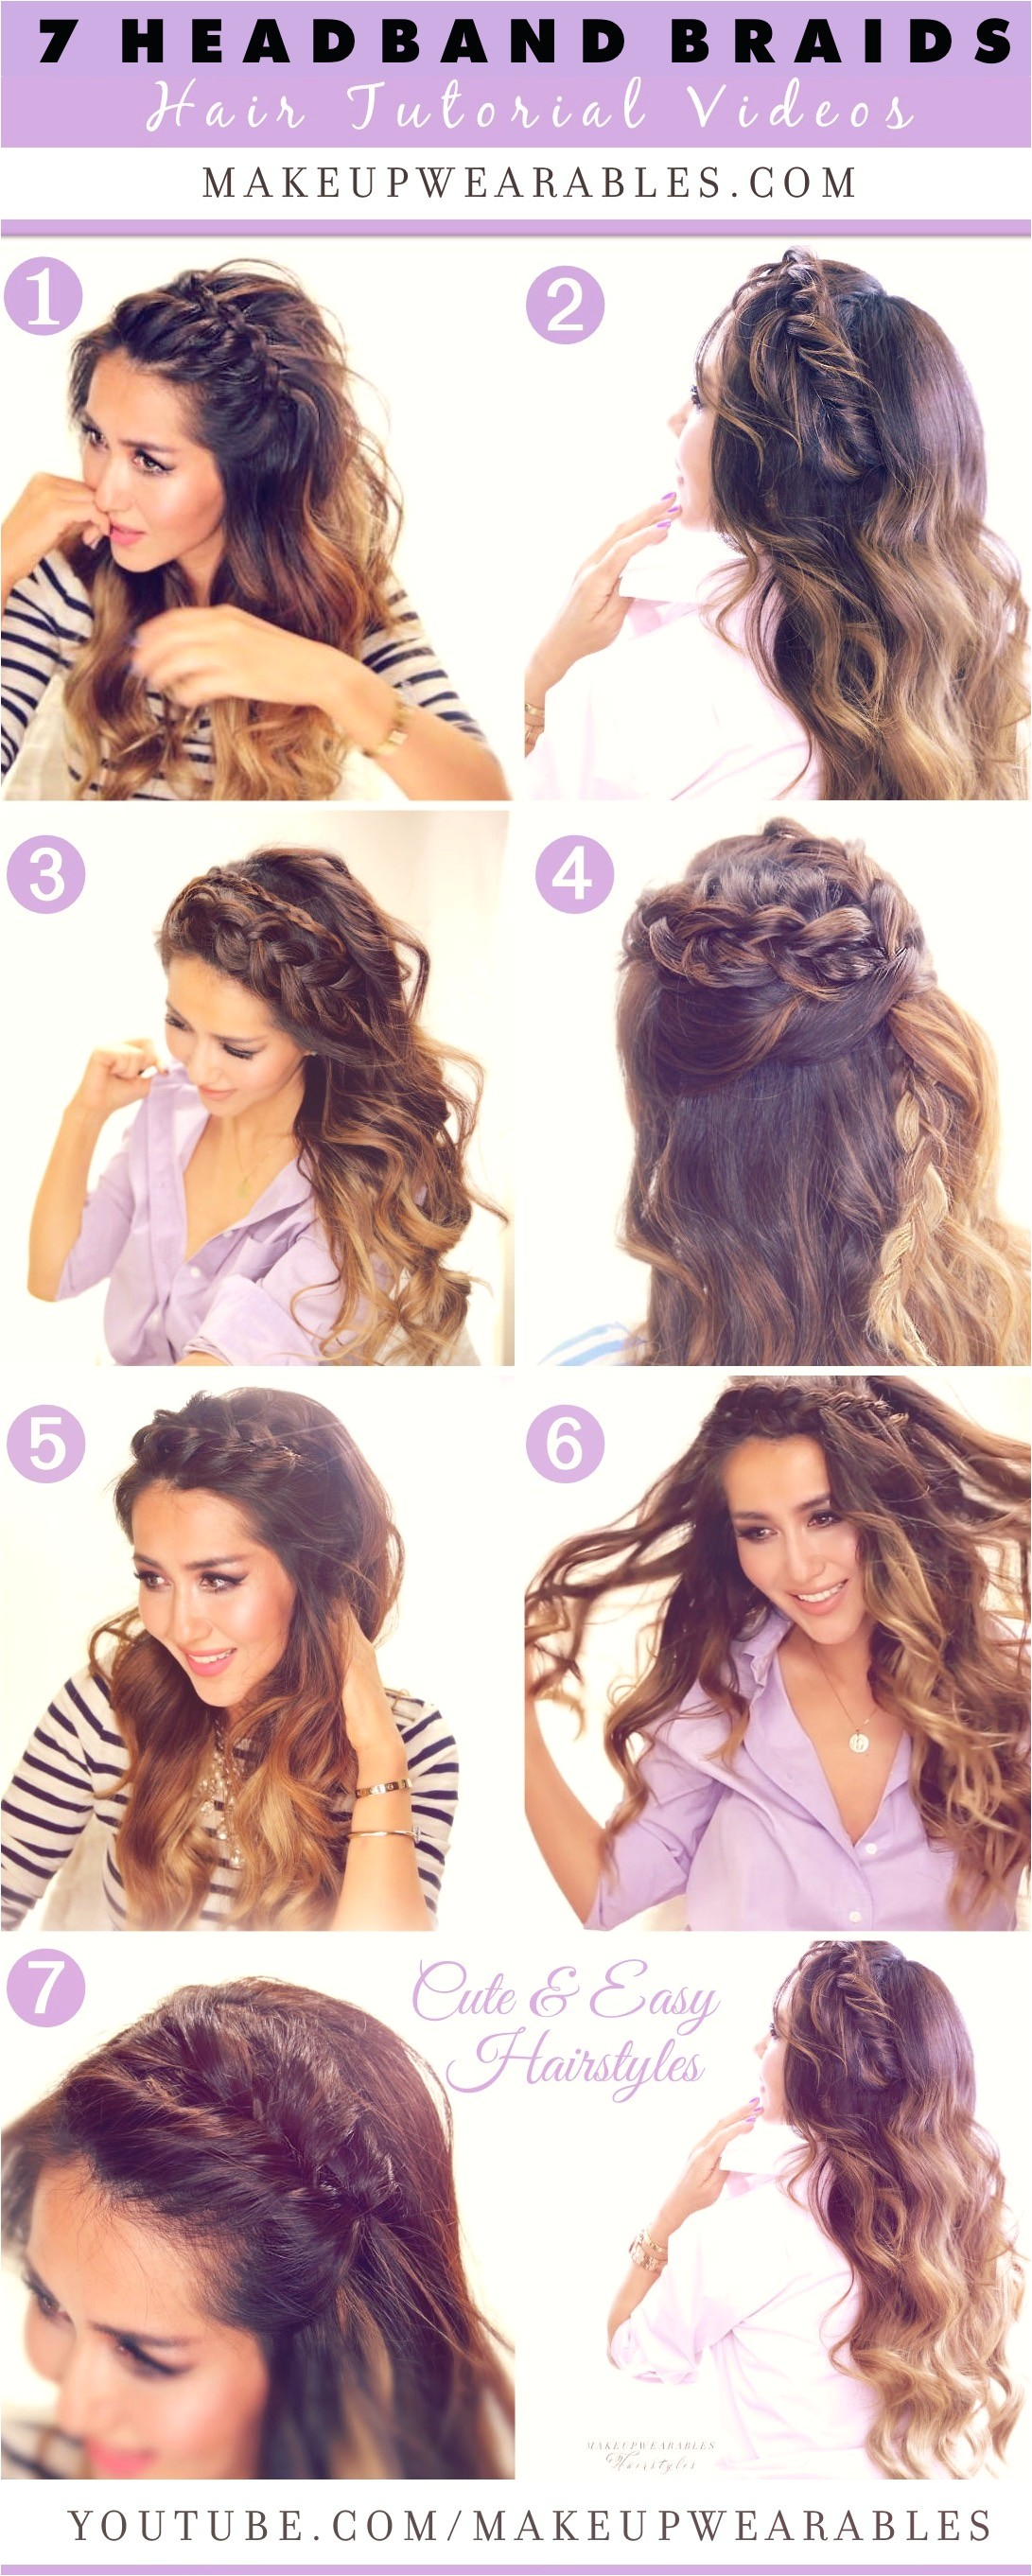 how to headband braids respond